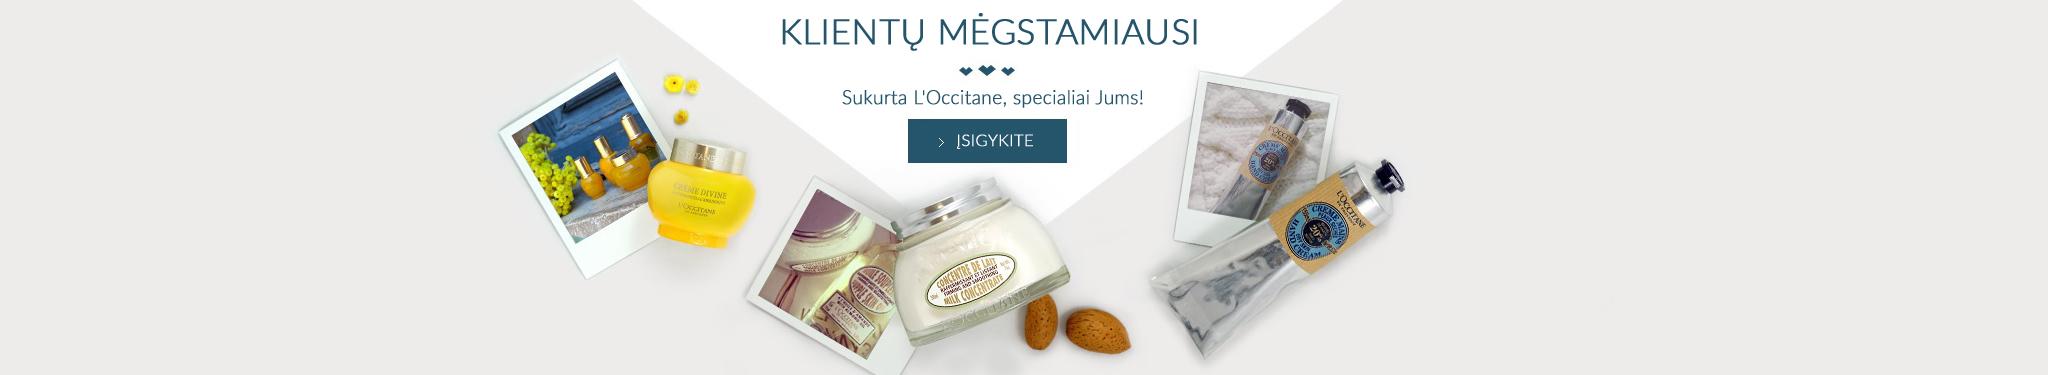 perkamiausius L'Occitane produktai